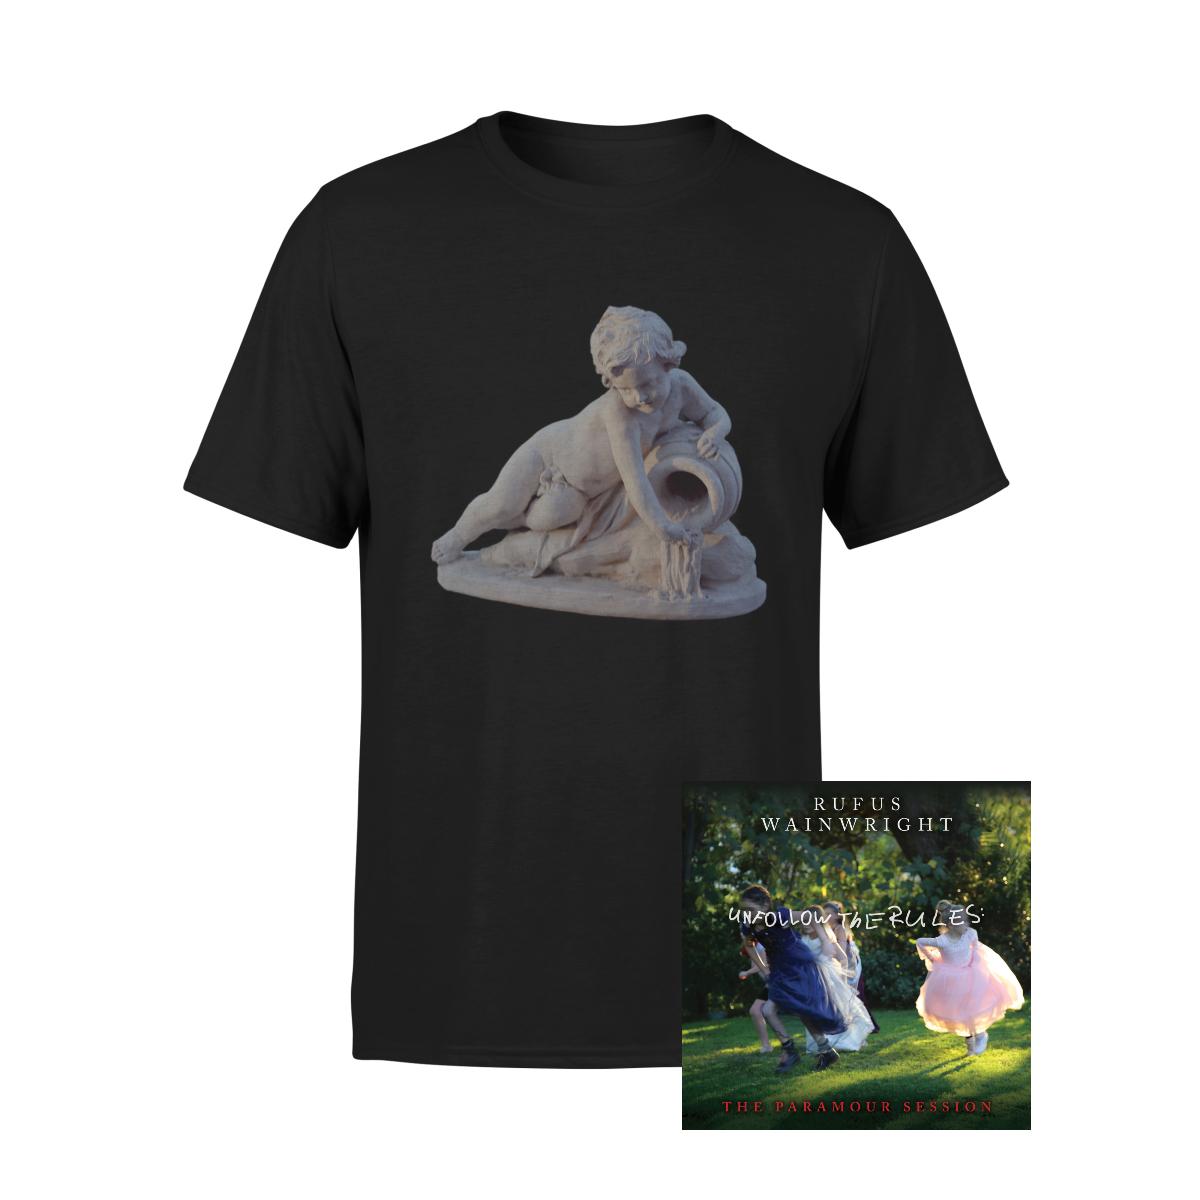 Unfollow The Rules - Paramour Sessions Vinyl + Exclusive T-shirt Bundle